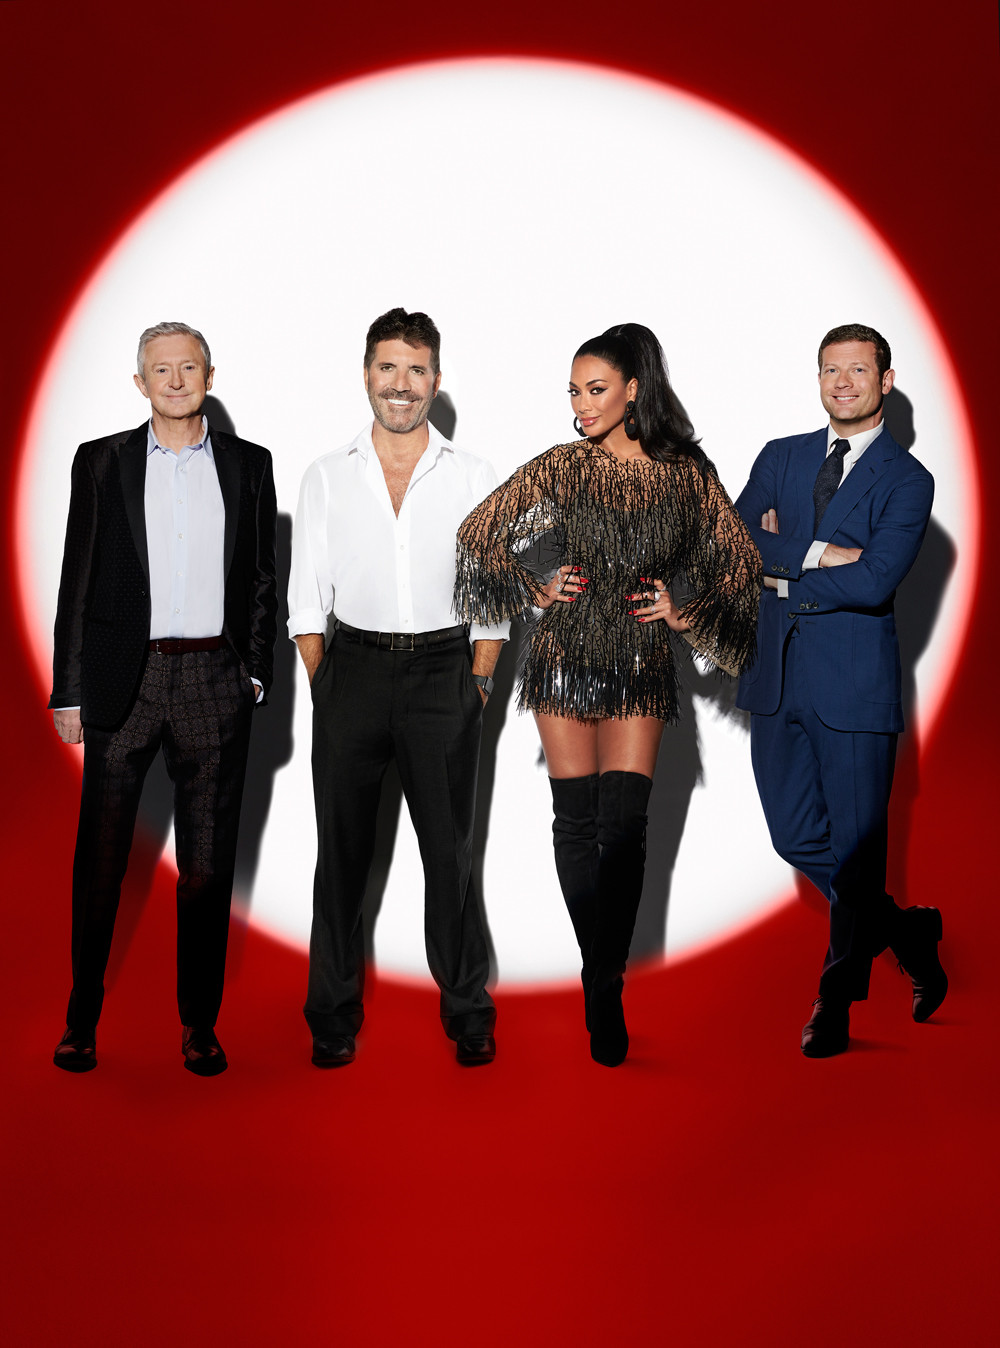 X Factor: Celebrity - The Judges, Simon Cowell, Nicole Scherzinger. Louis Walsh and Dermot O'Leary